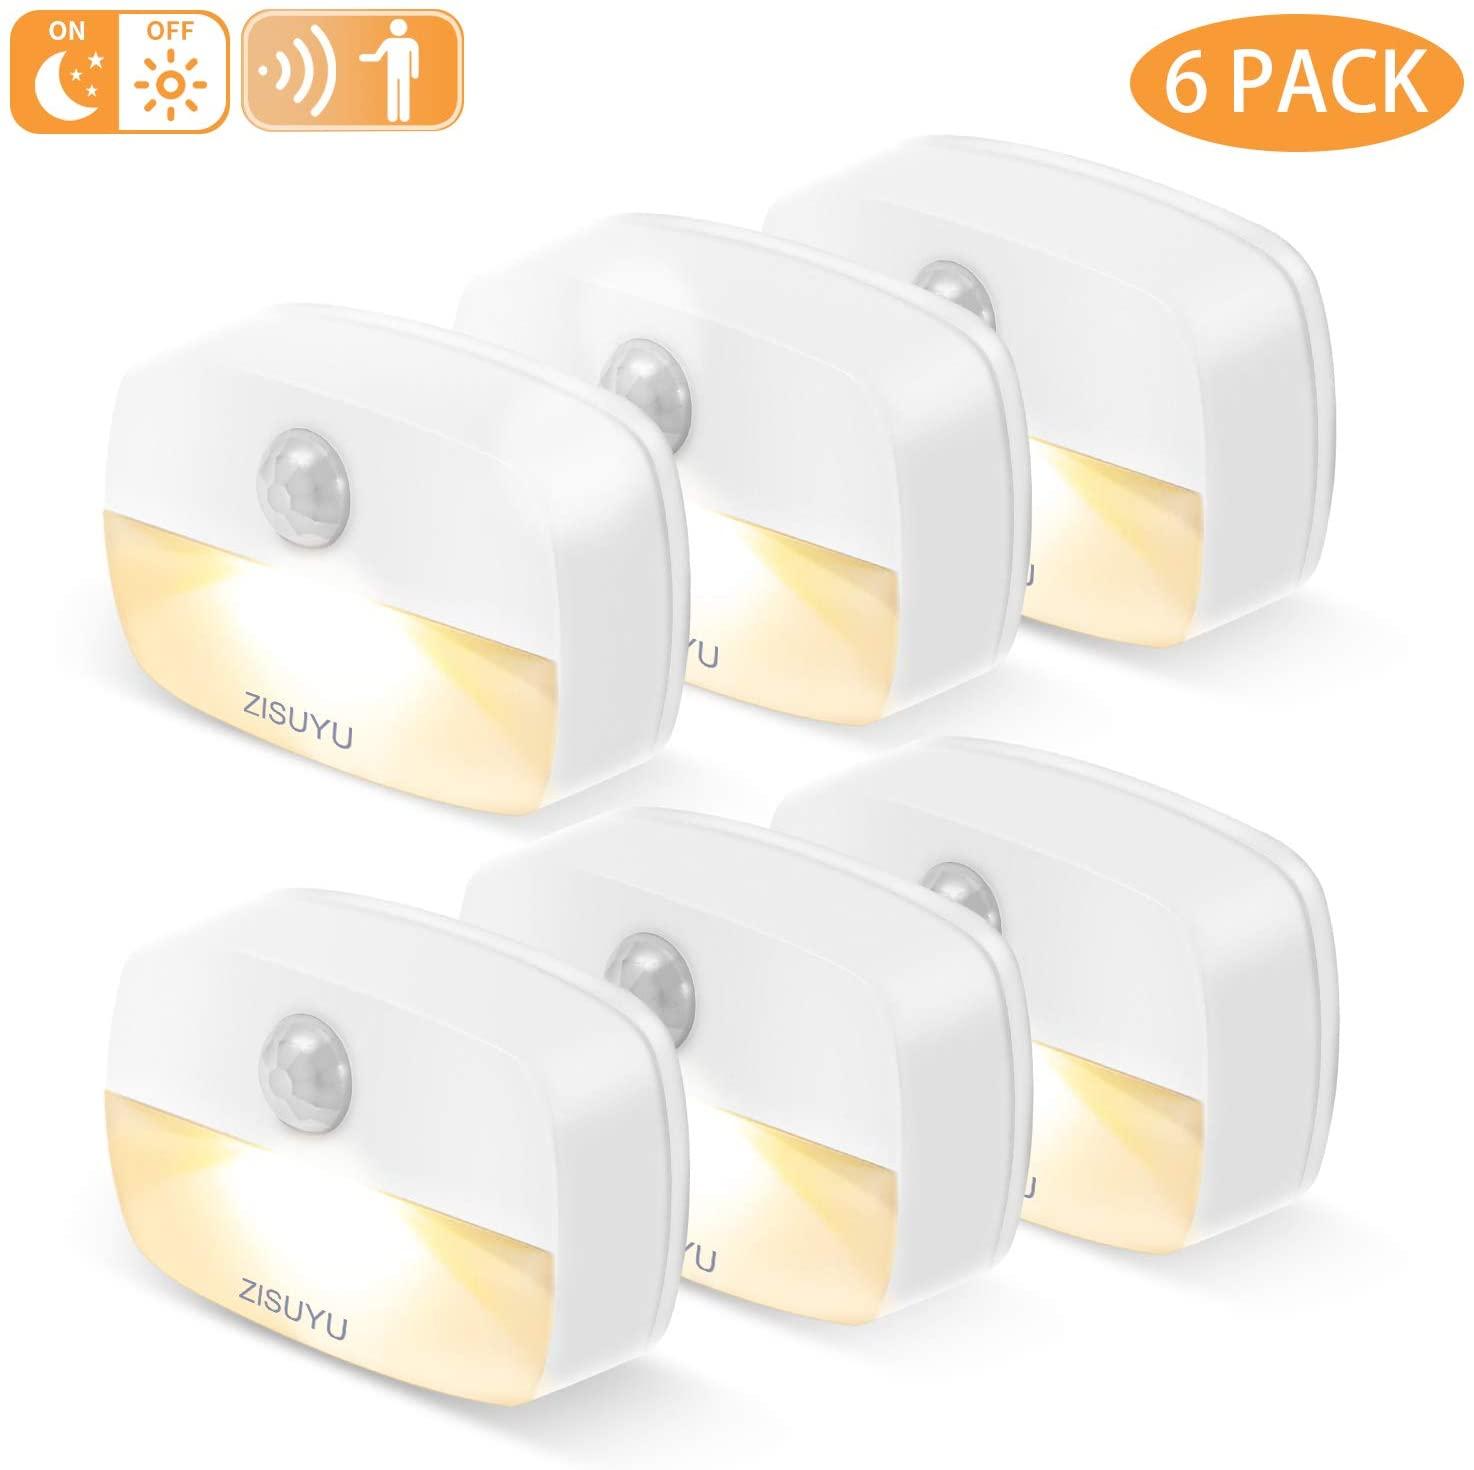 ZISUYU Motion Sensor Light Indoor, Battery-Powered LED Night Light, Stick-Anywhere Nightlight, Battery Operated Lights, Wall Lights, Ideal for Closet, Hallway, Kitchen, Bathroom, Bedroom, Stairs